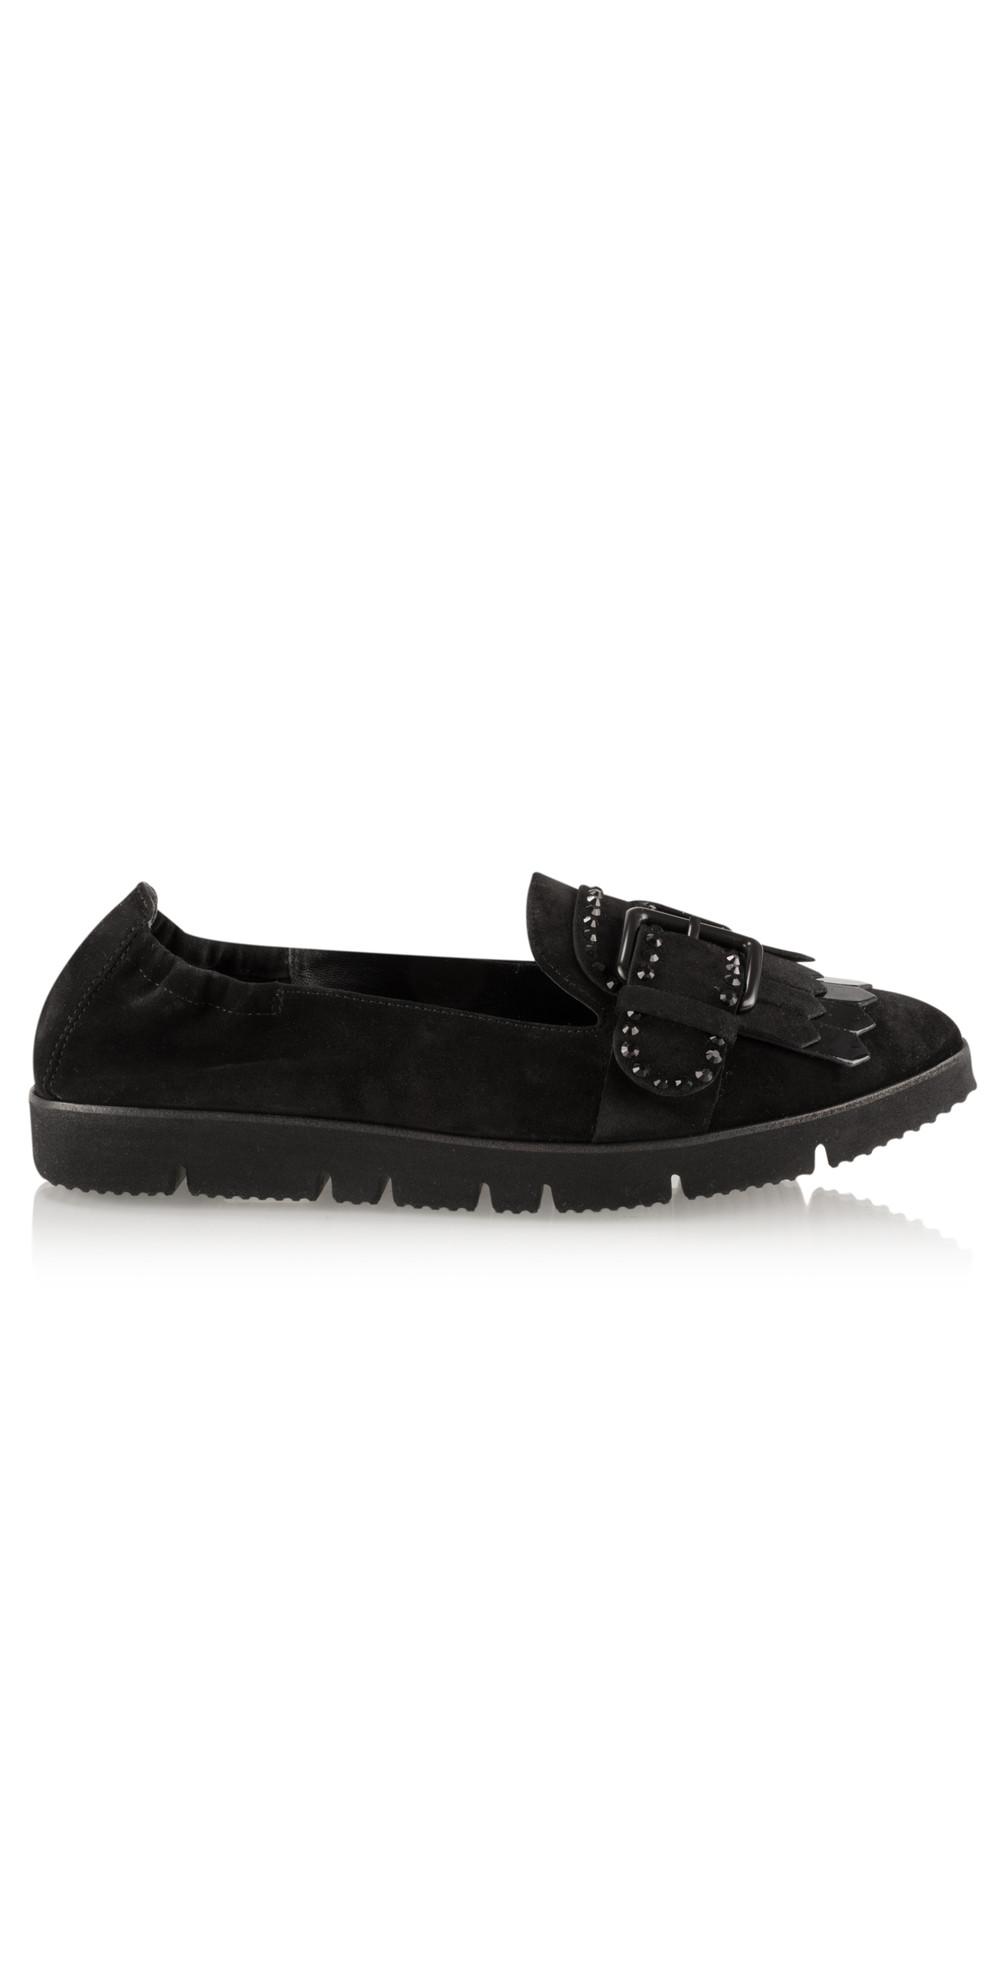 kennel und schmenger pia x buckle fringe shoe in schwarz. Black Bedroom Furniture Sets. Home Design Ideas